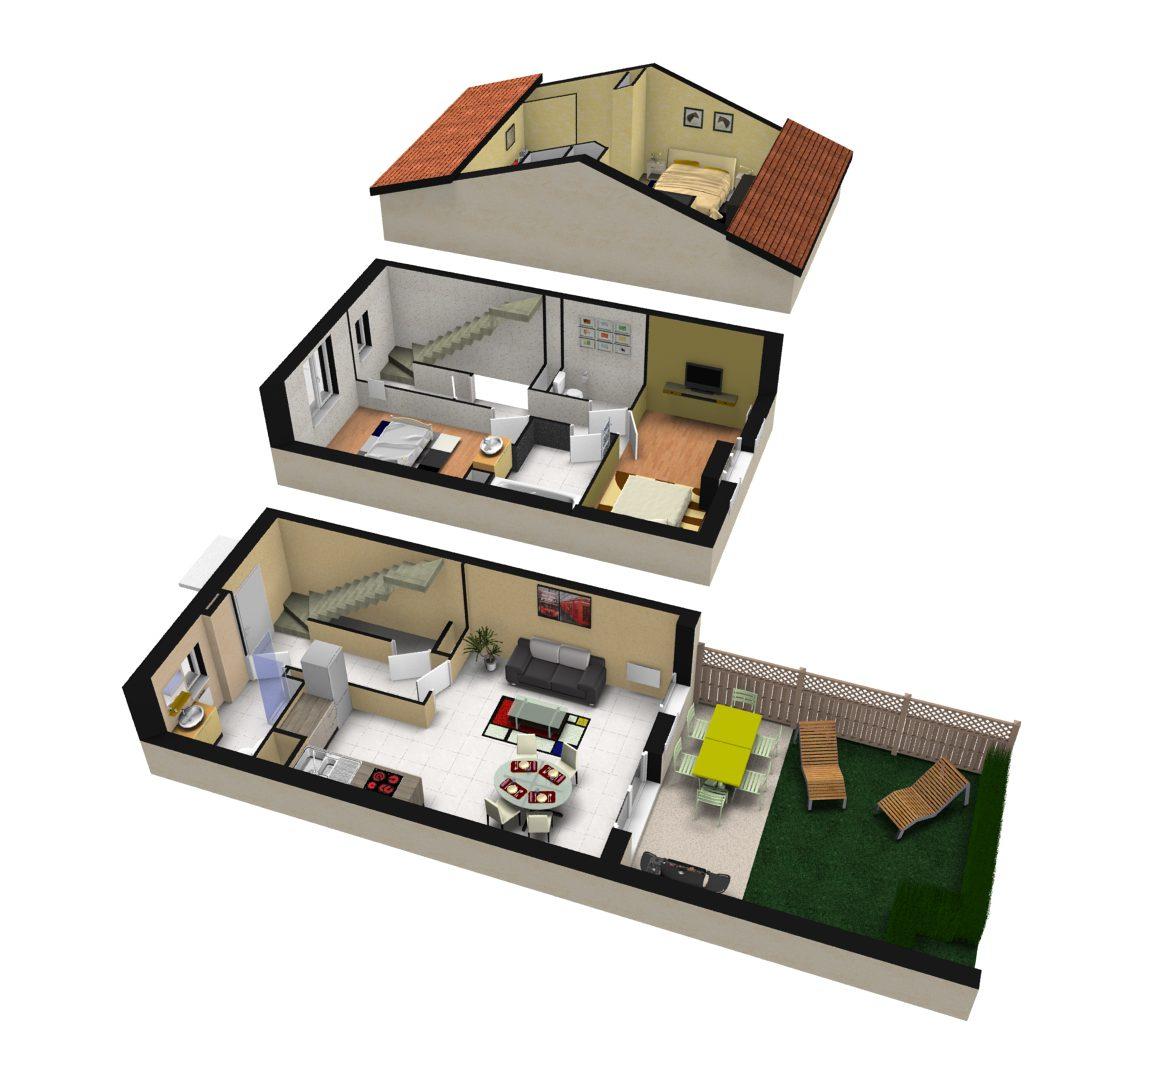 maquette virtuelle opaline 1 service maquette interactive